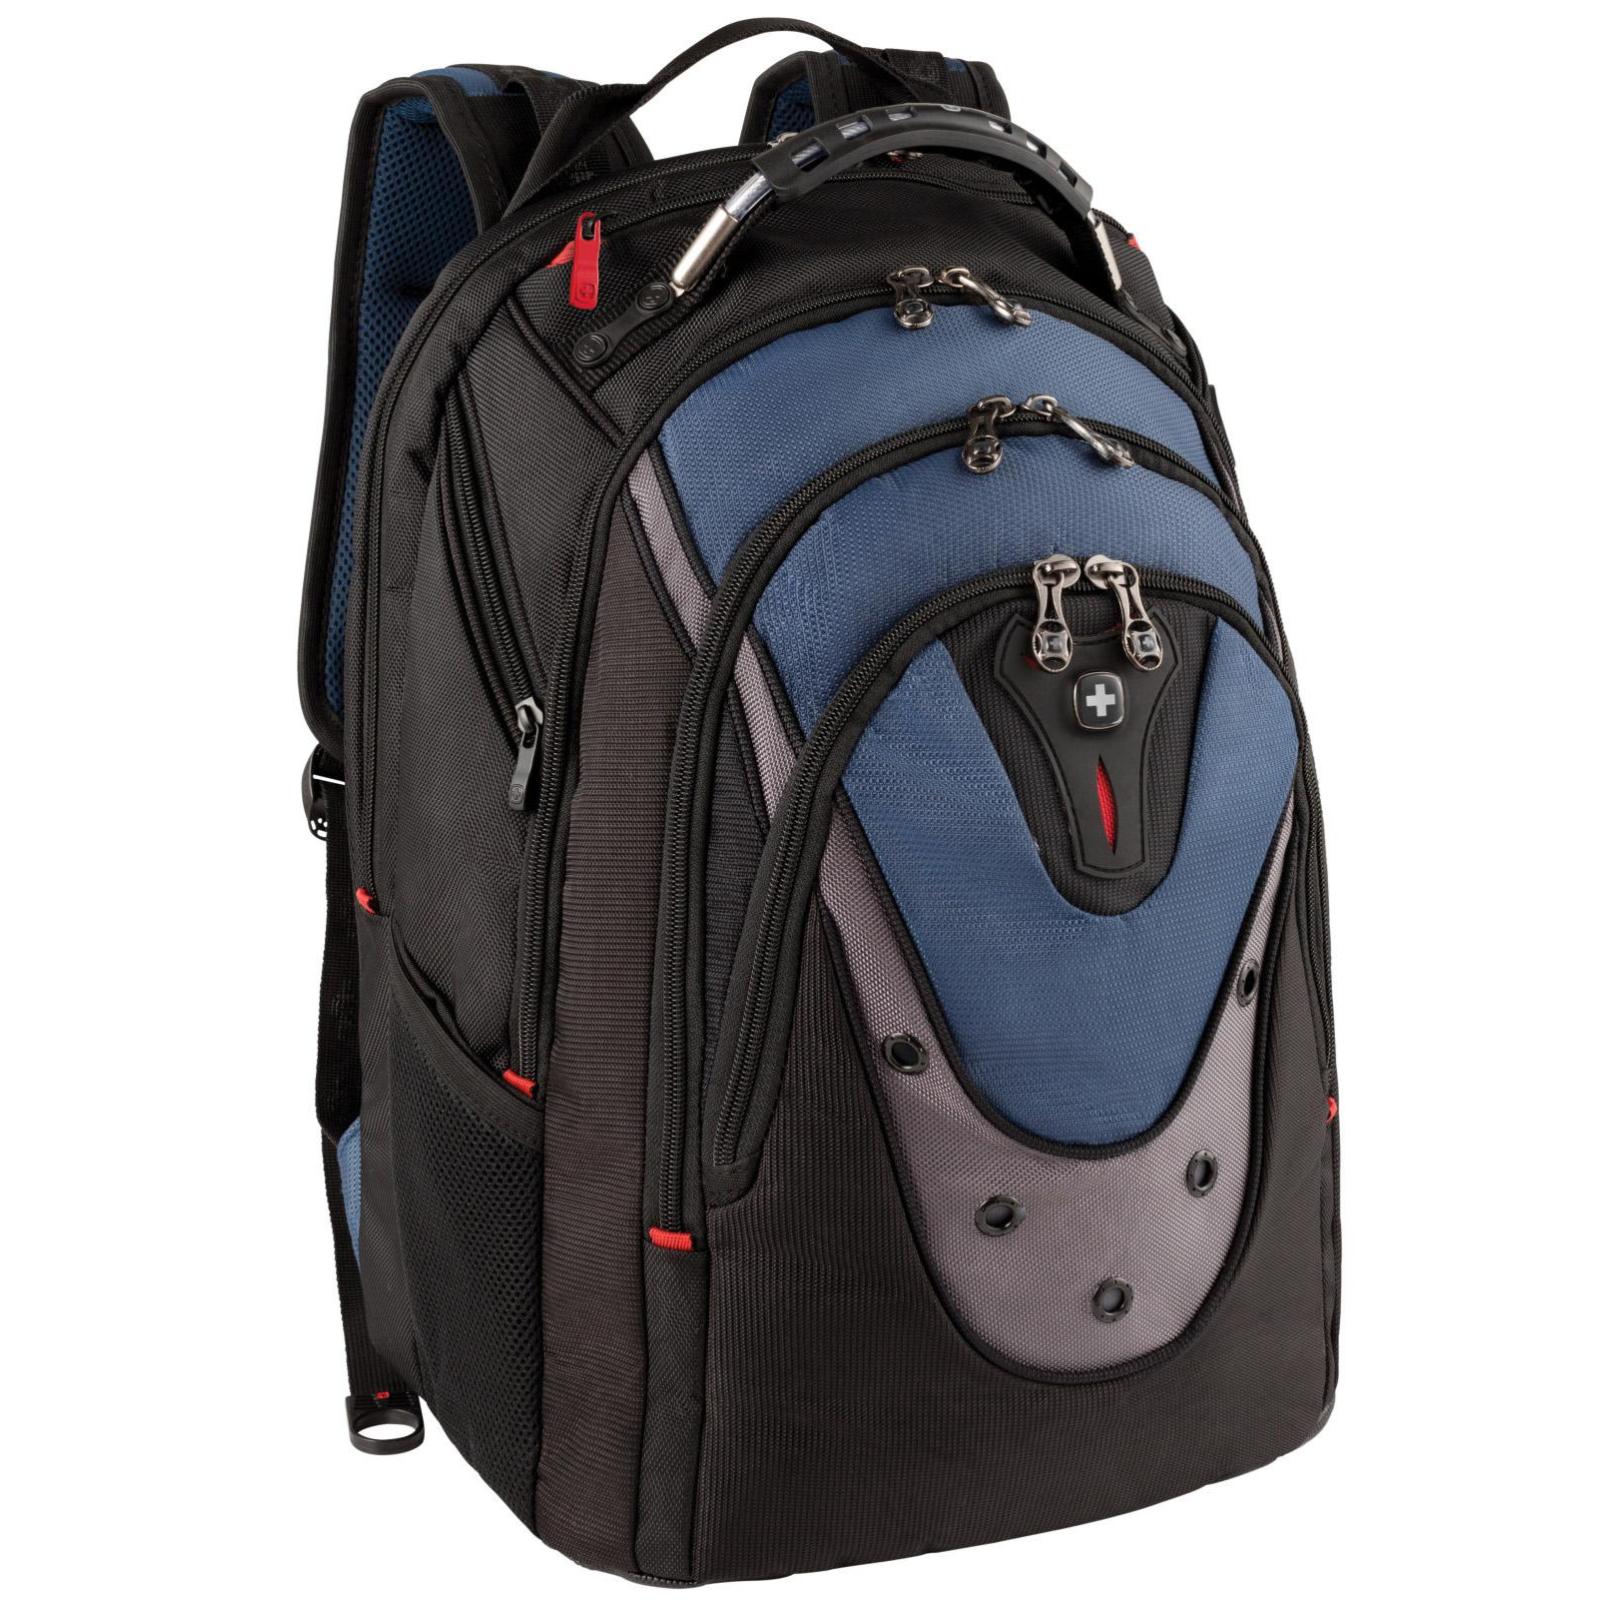 "Рюкзак для ноутбука Wenger 17"" Ibex Black/Blue (600638)"